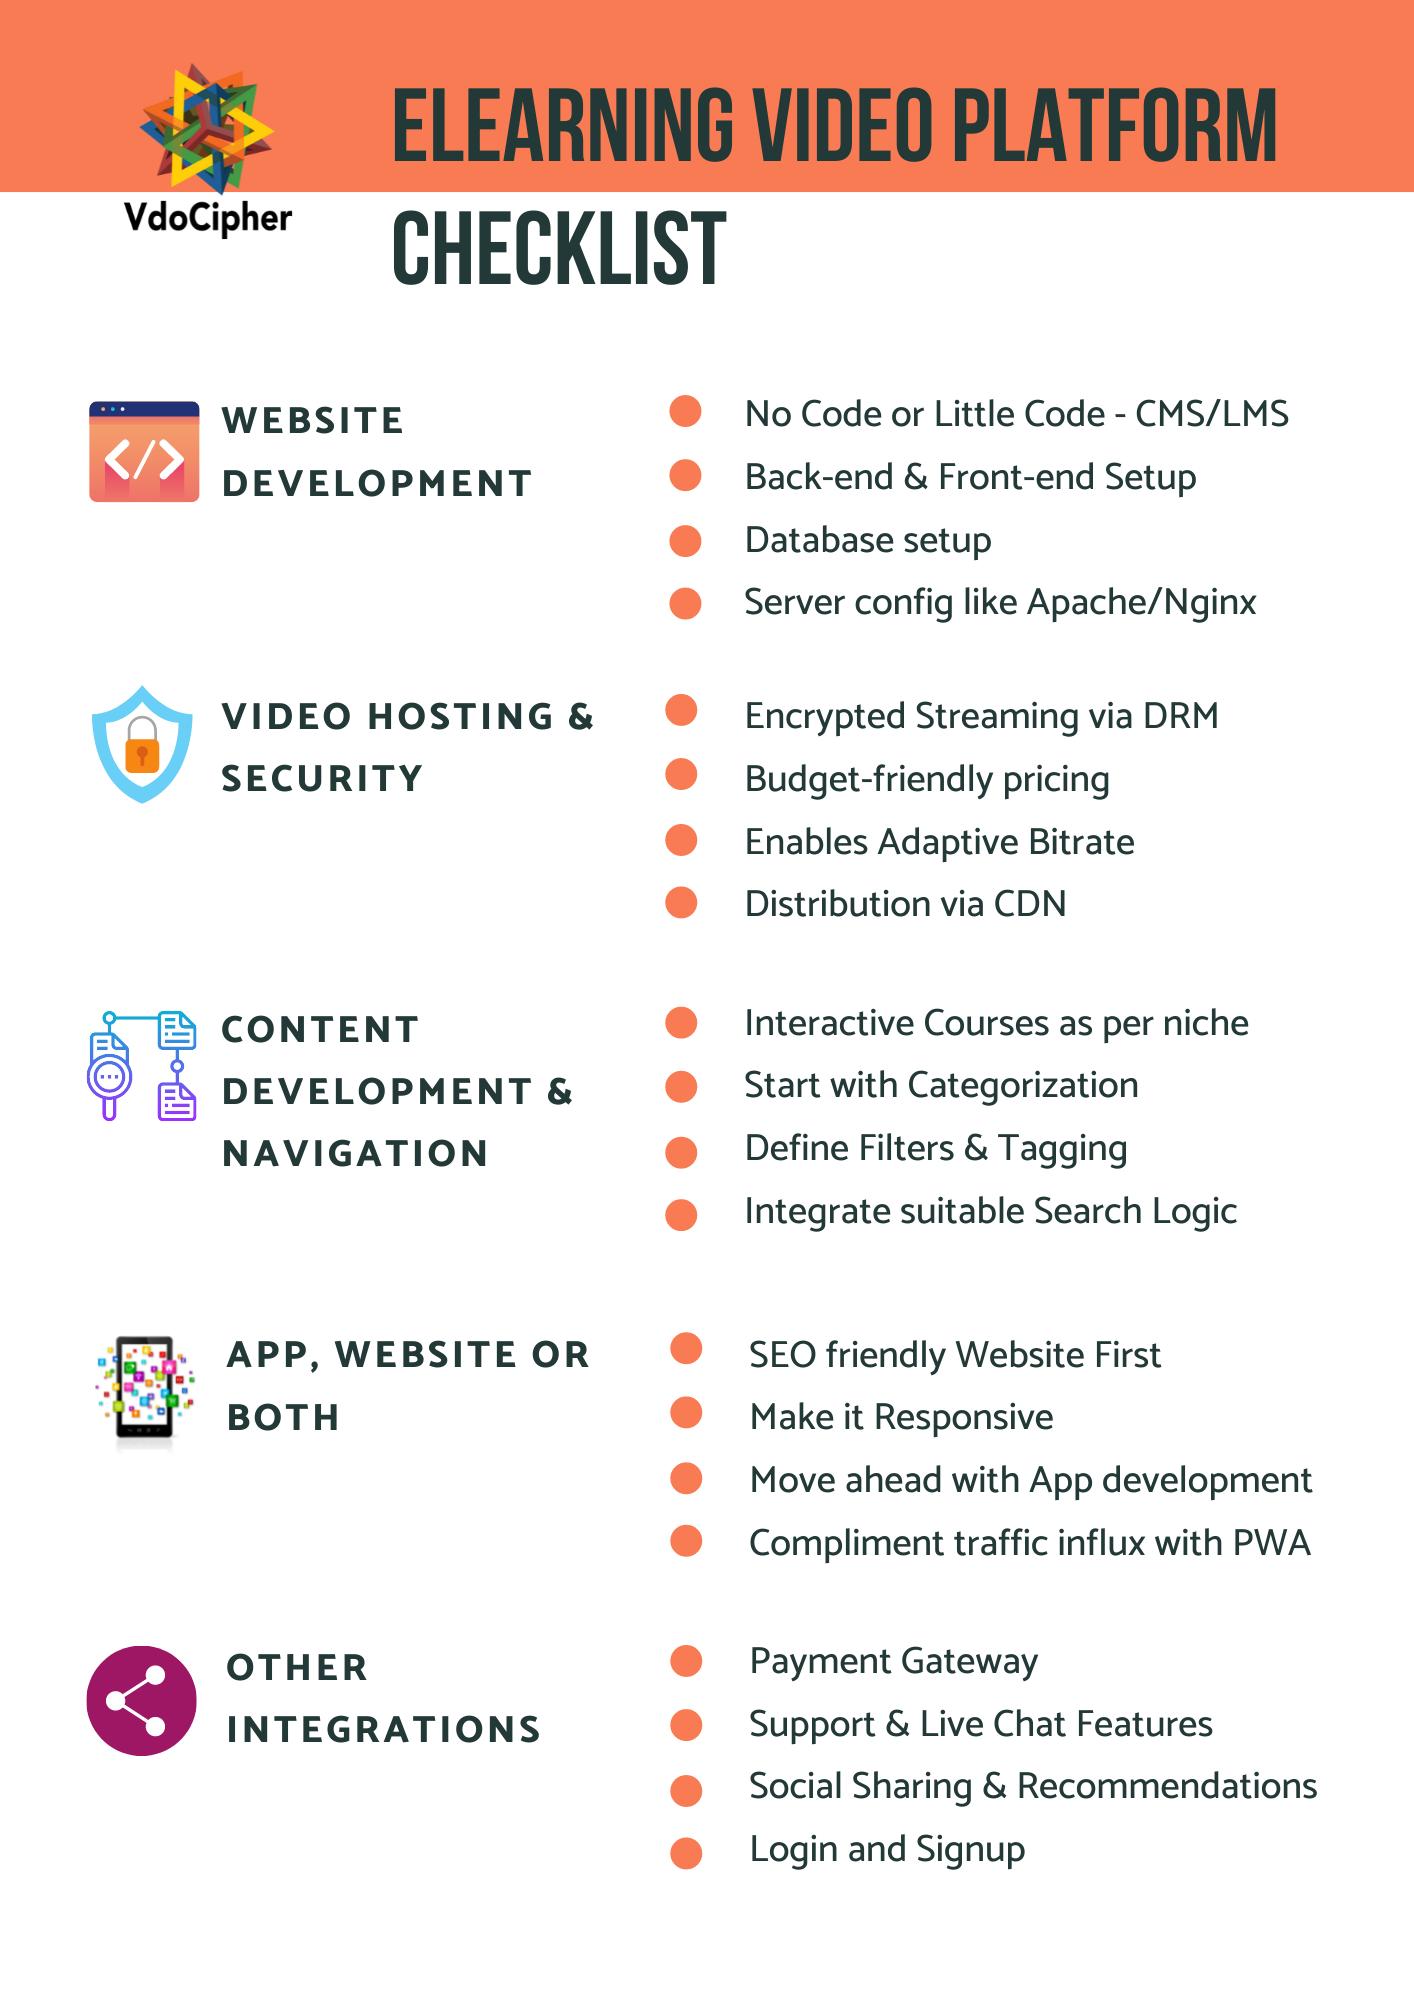 eLearning Video Platform Checklist Guide